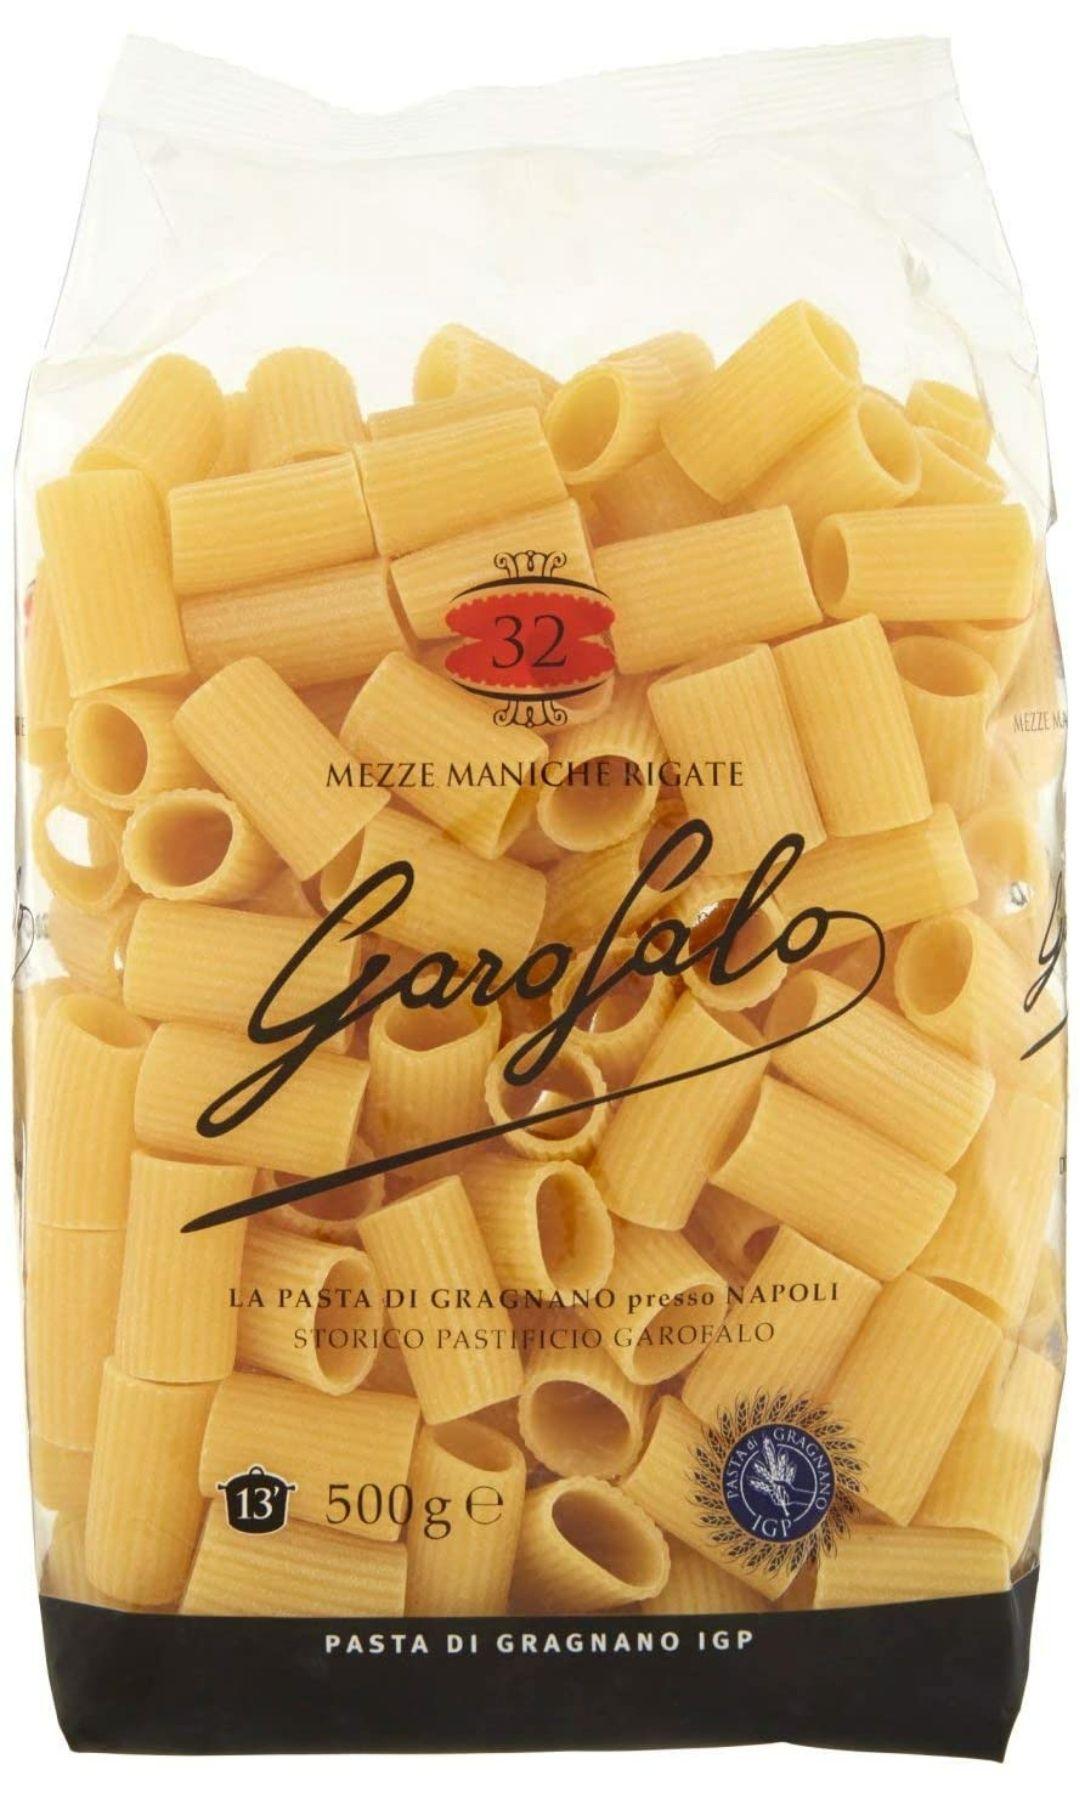 Garofalo Mezze Maniche Rigate, 500g